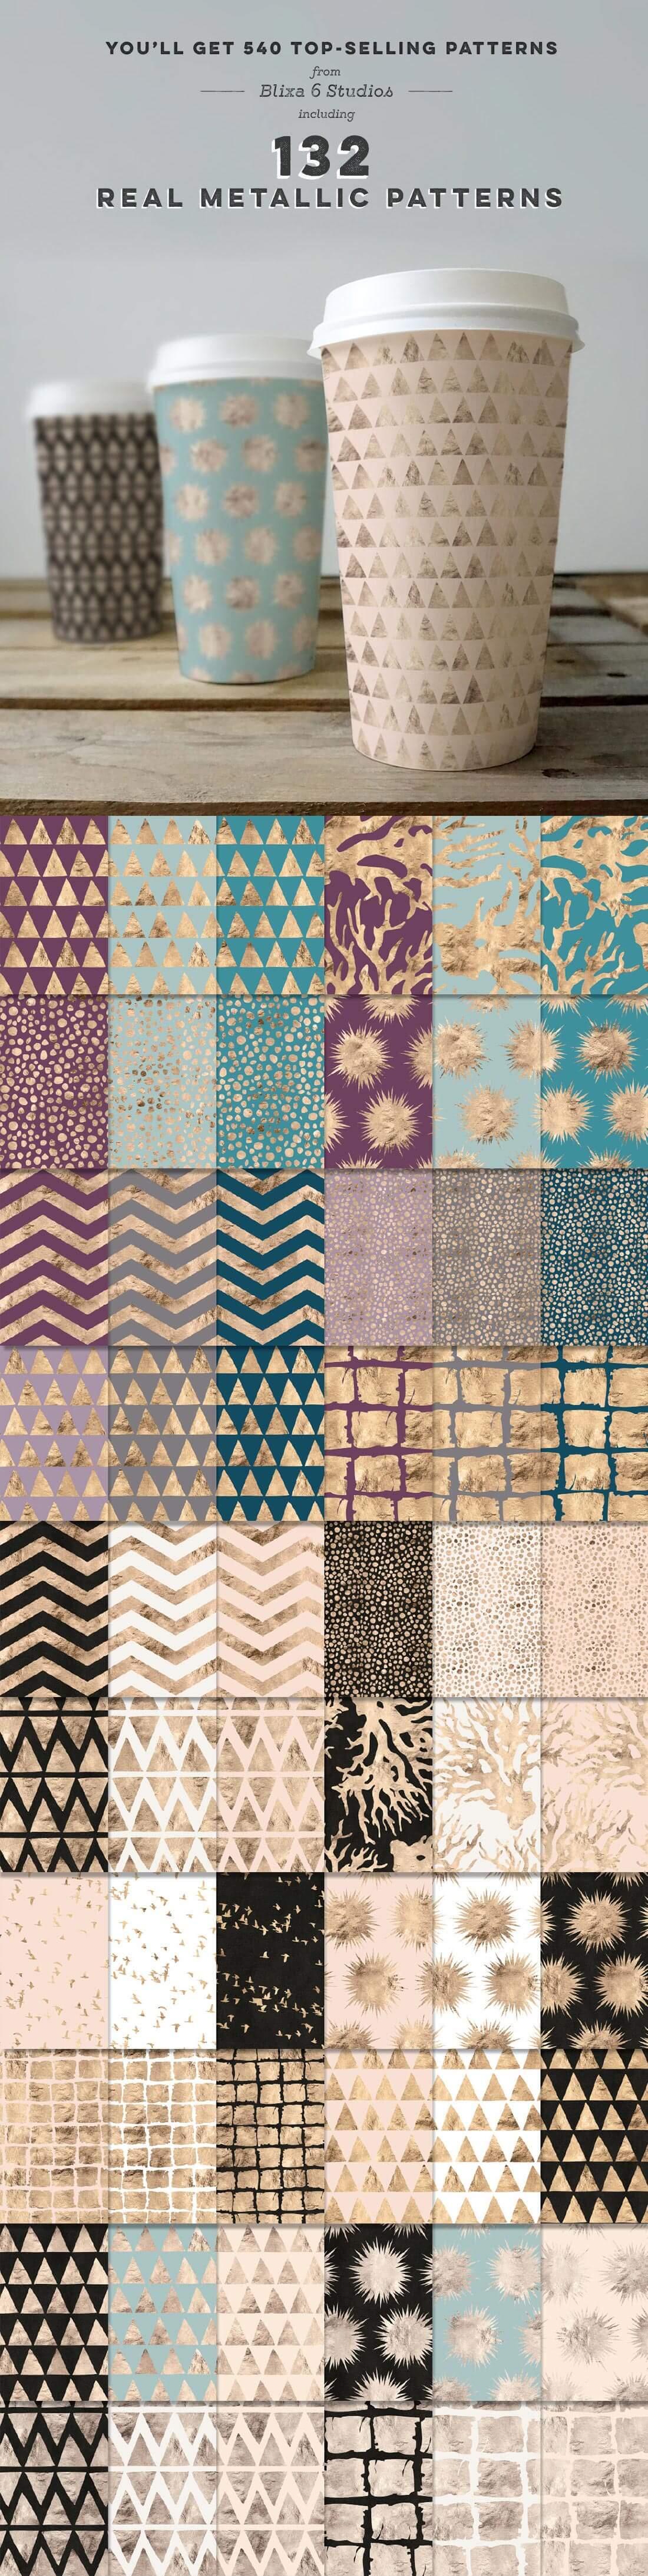 540 Geometric Patterns Super Bundle from Blixa 6 Studios - Blixa6Studios 1